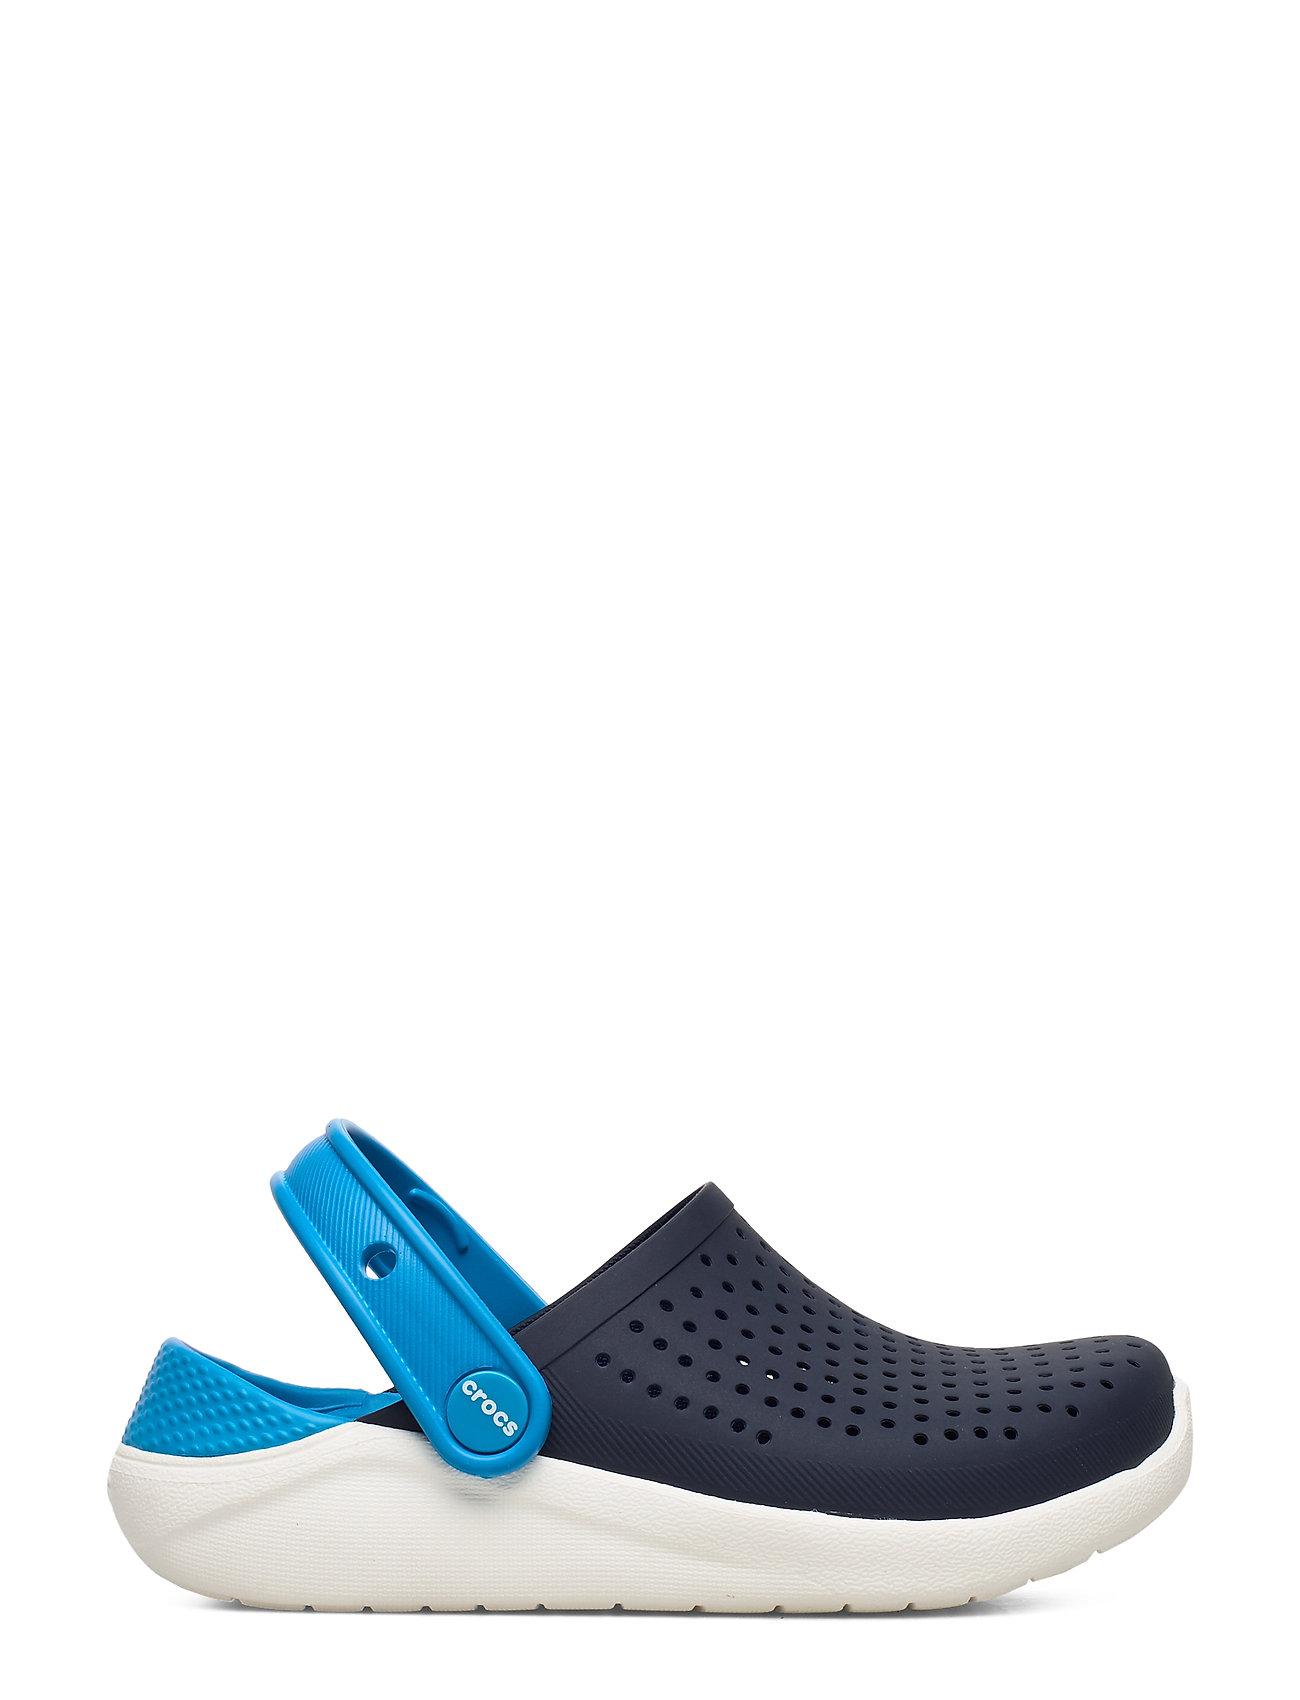 Crocs - LiteRide Clog K - navy/white - 1